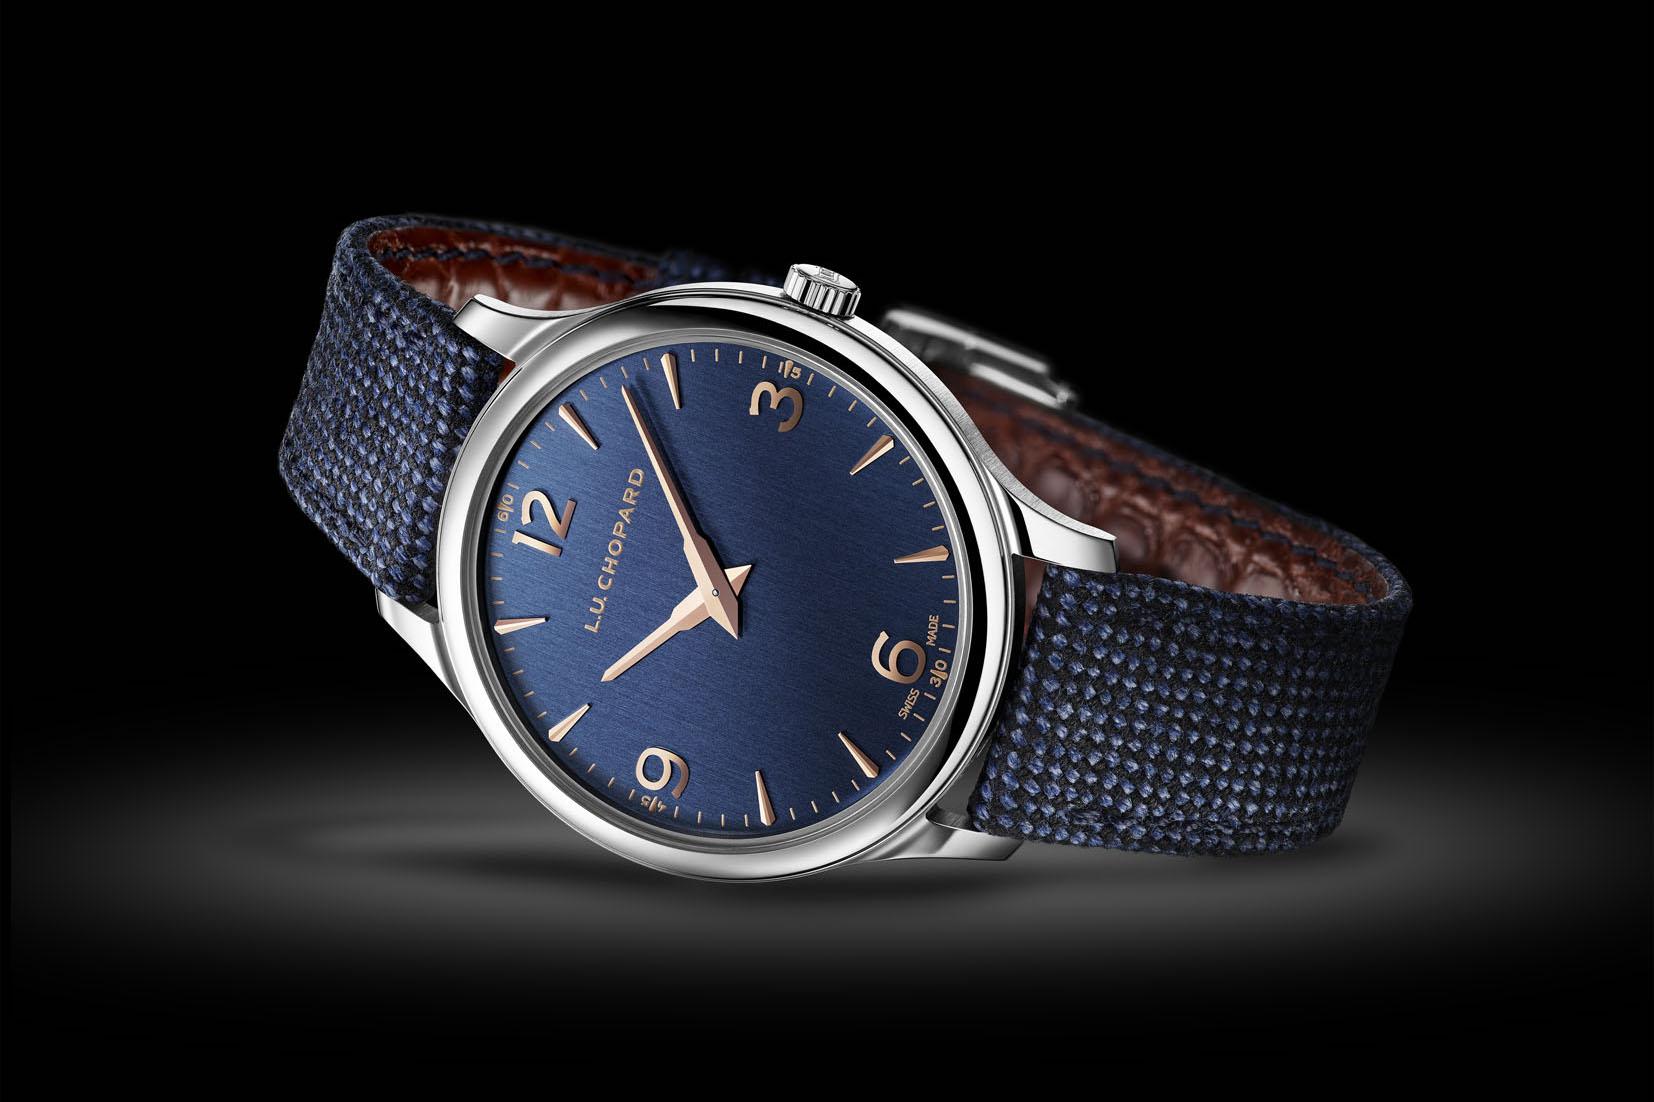 Chopard L.U.C XP Navy Blue Monochrome Watches